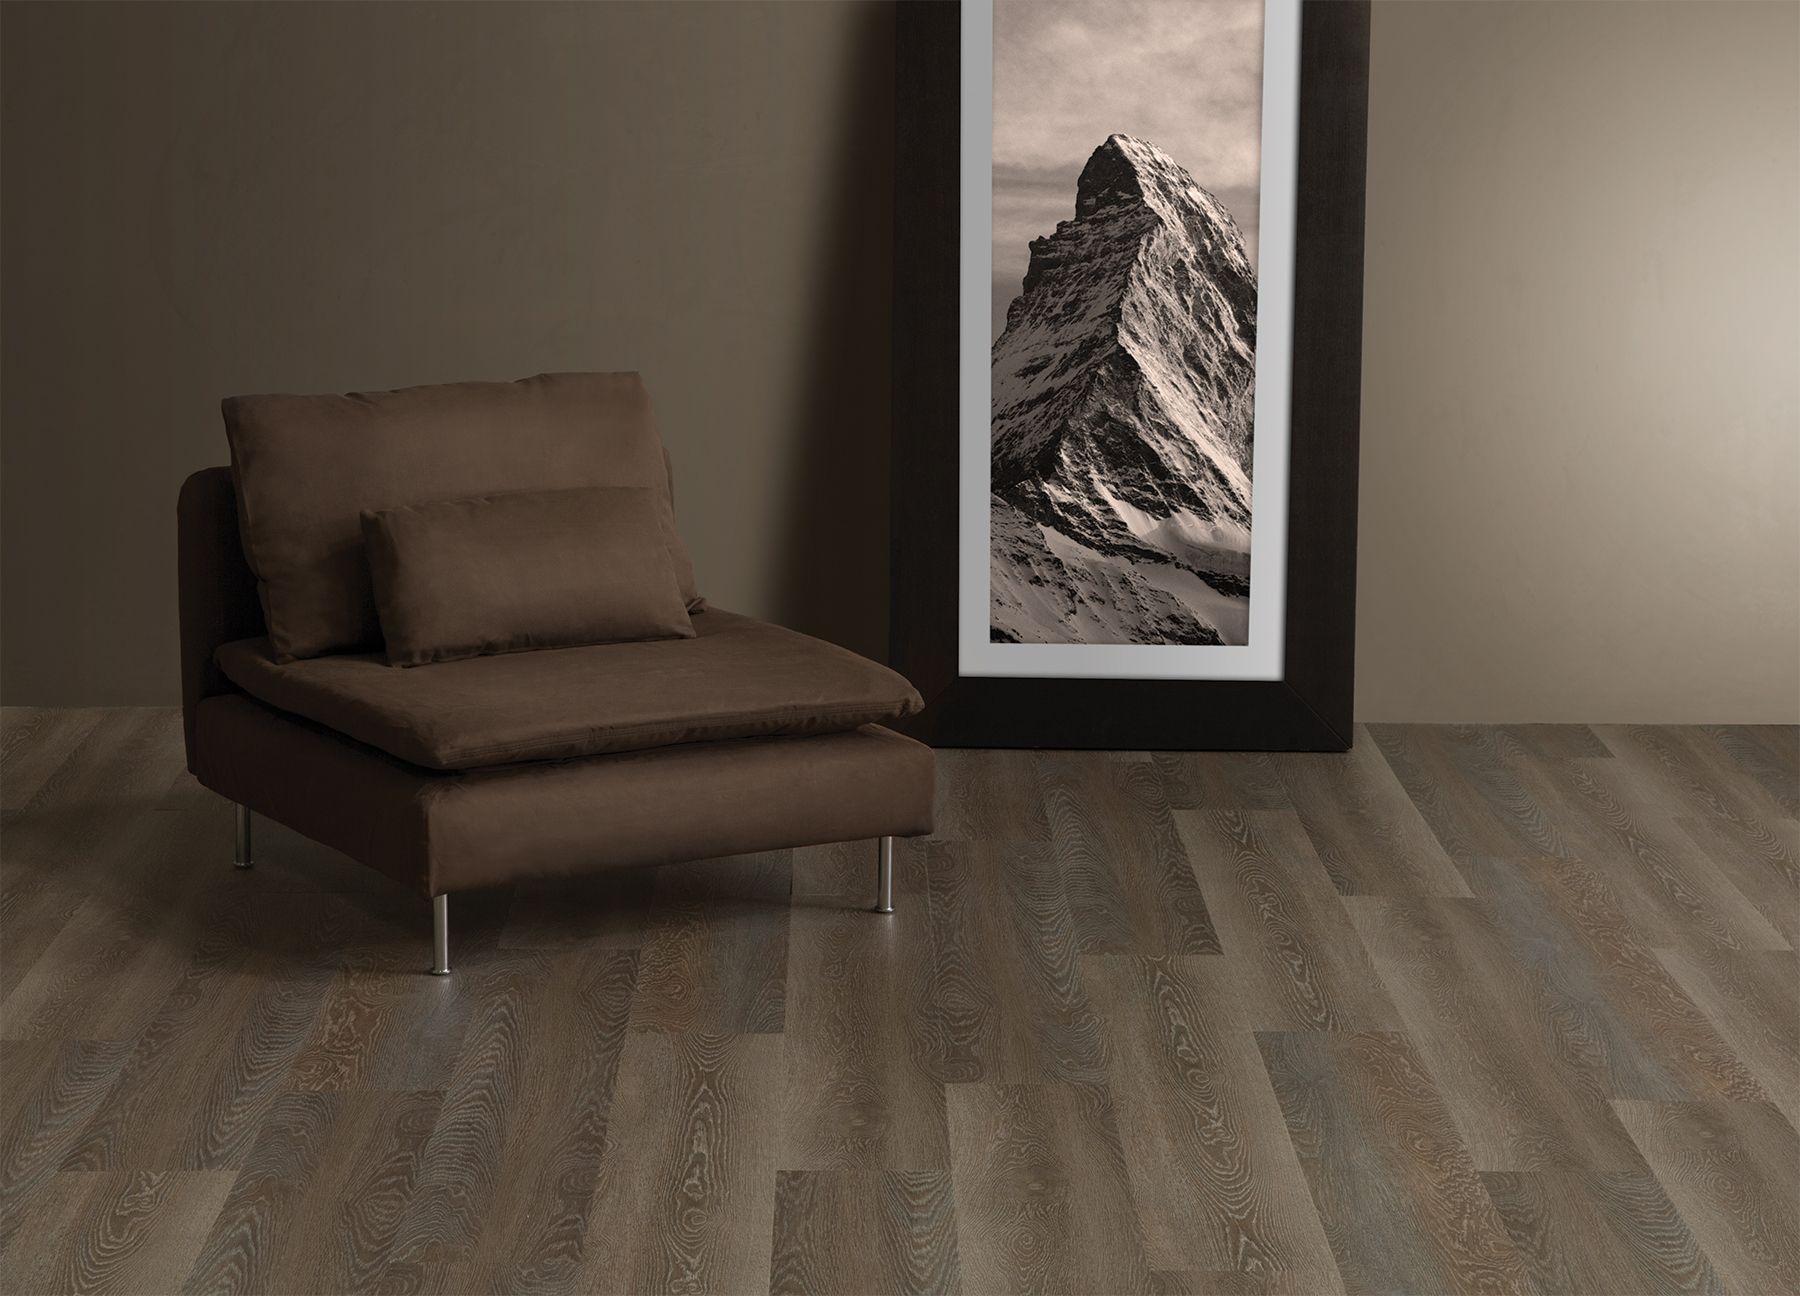 Wilhelm Duchateau The Atelier Series Luxury Vinyl The Sovereign Edition Luxury Vinyl Luxury Vinyl Flooring Flooring